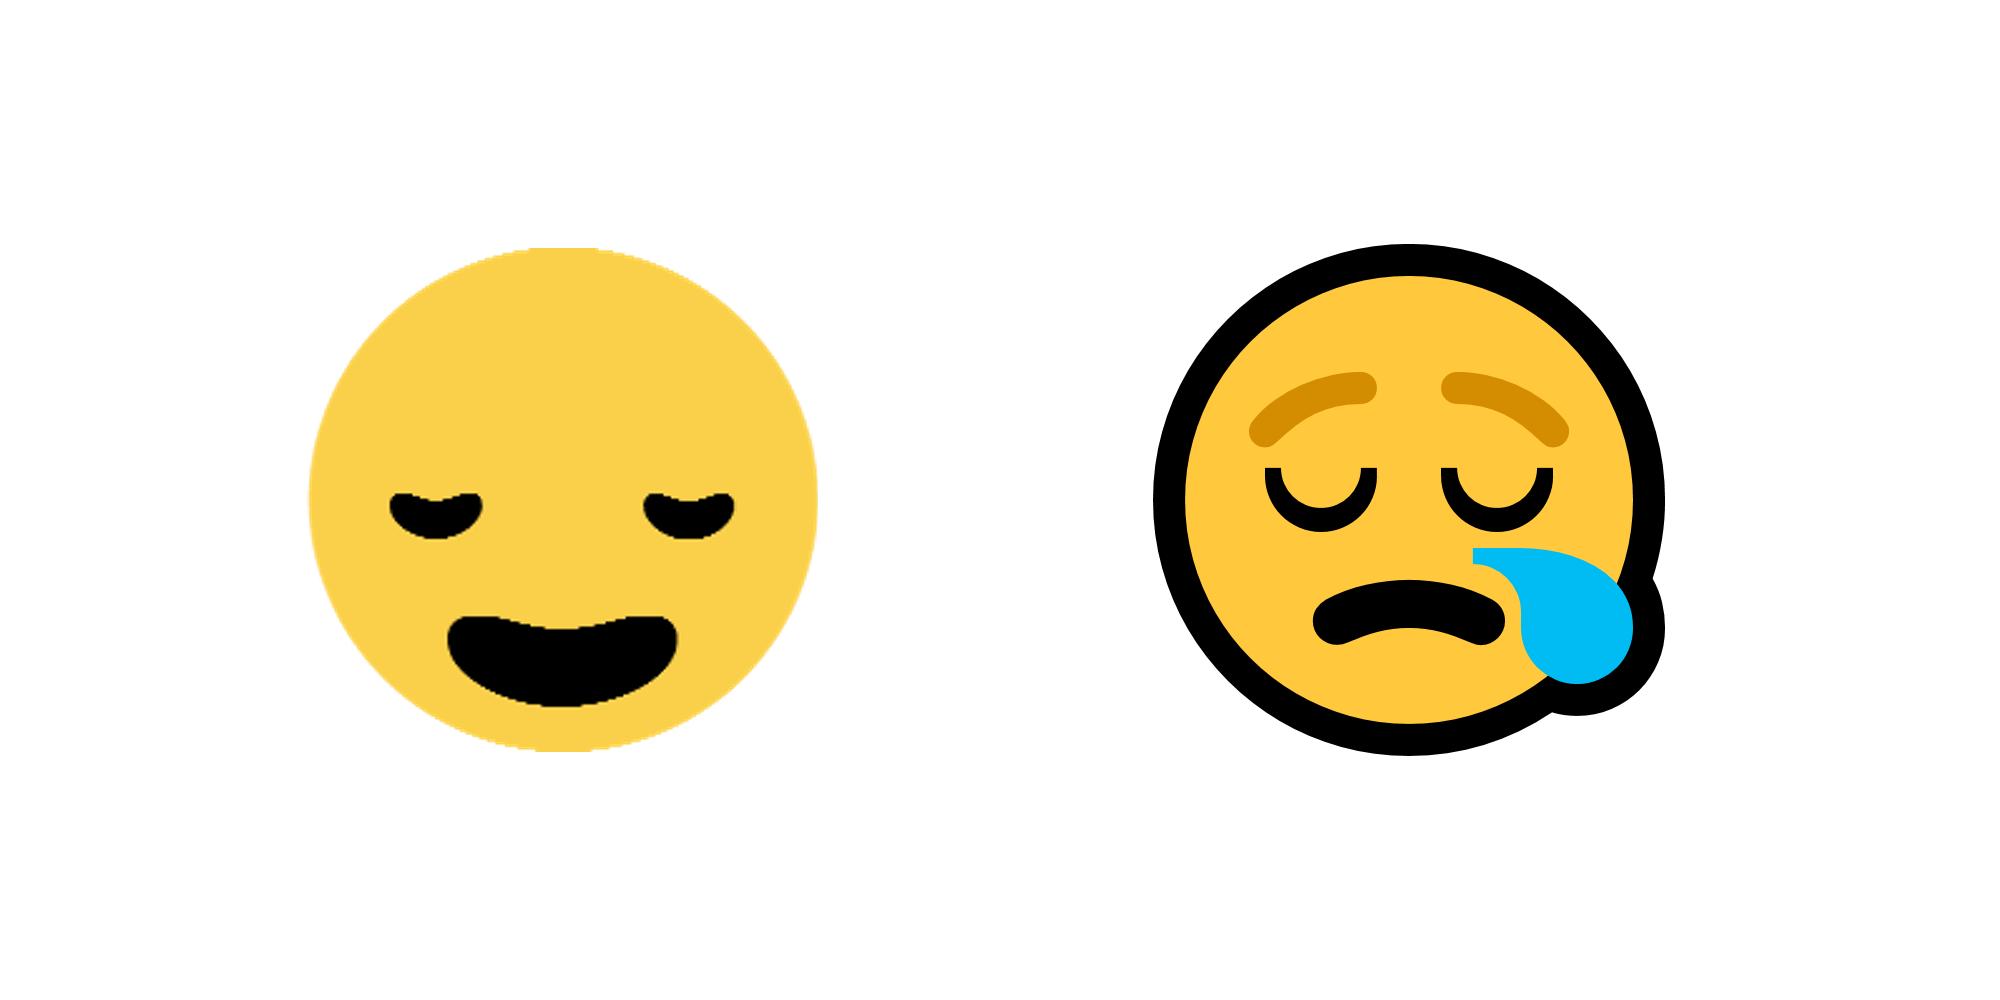 astonished face emoji emojipedia - HD2000×1000